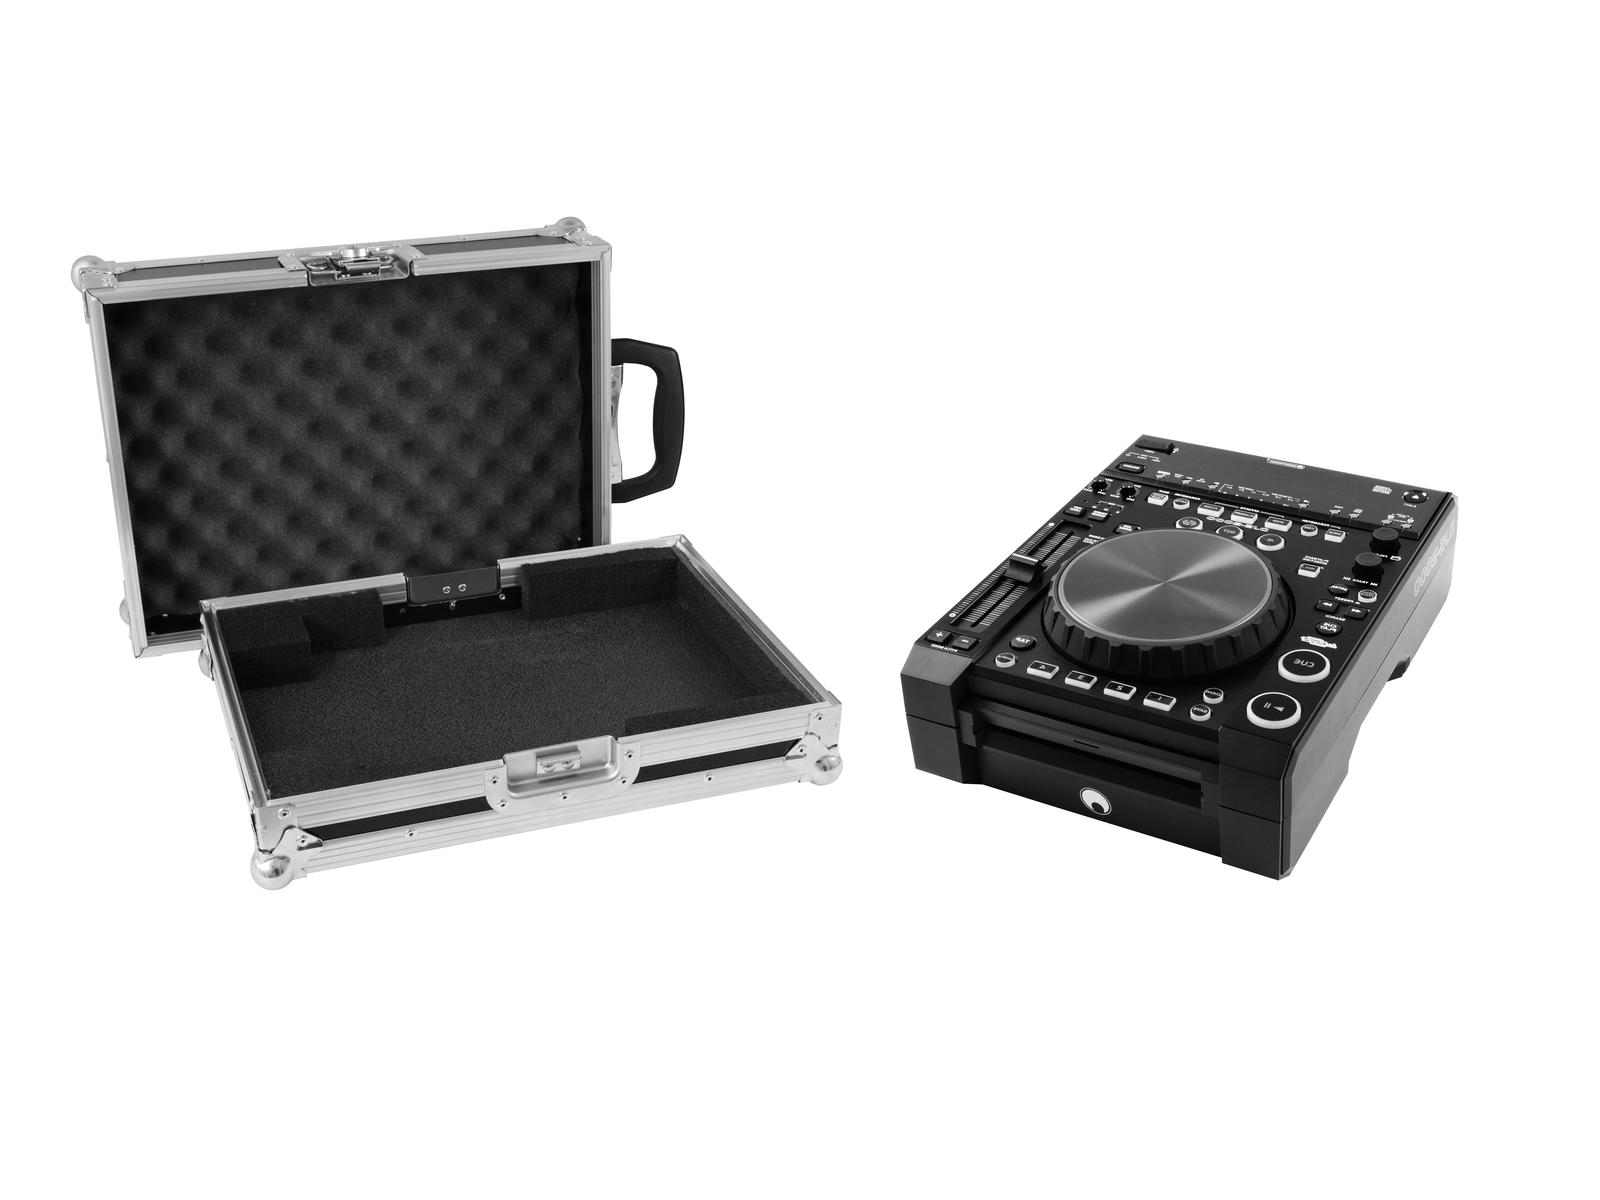 EUROLITE Set DJ-2000 DJ-Player + Caso